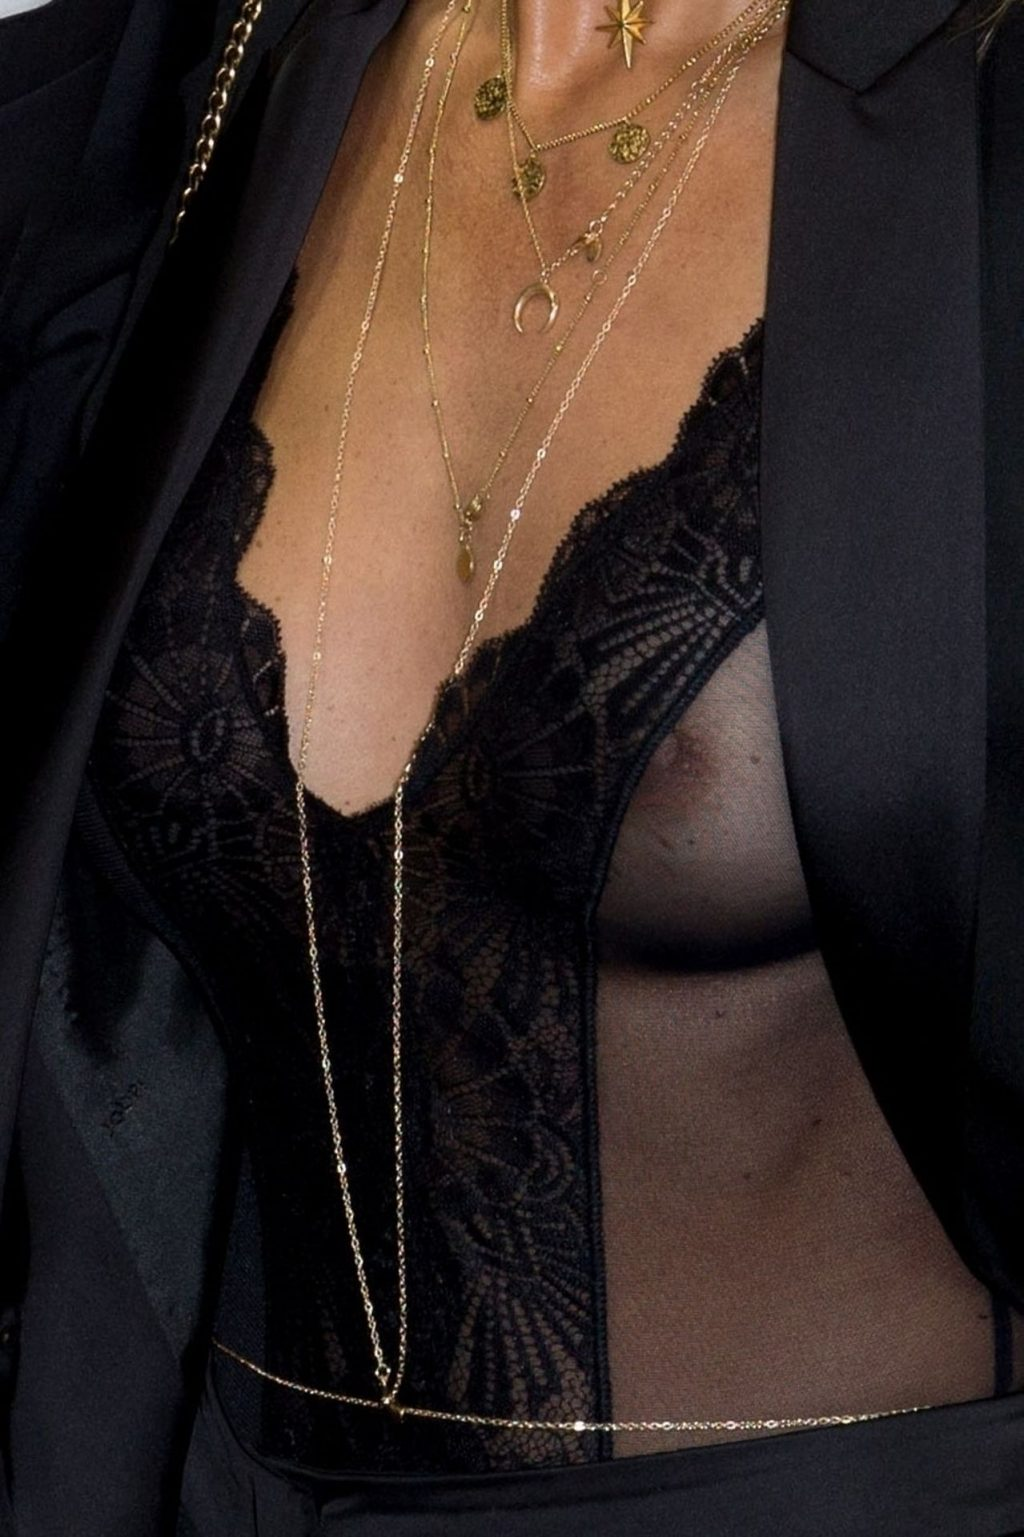 Fotos annemarie carpendale nackt Annemarie Carpendale: